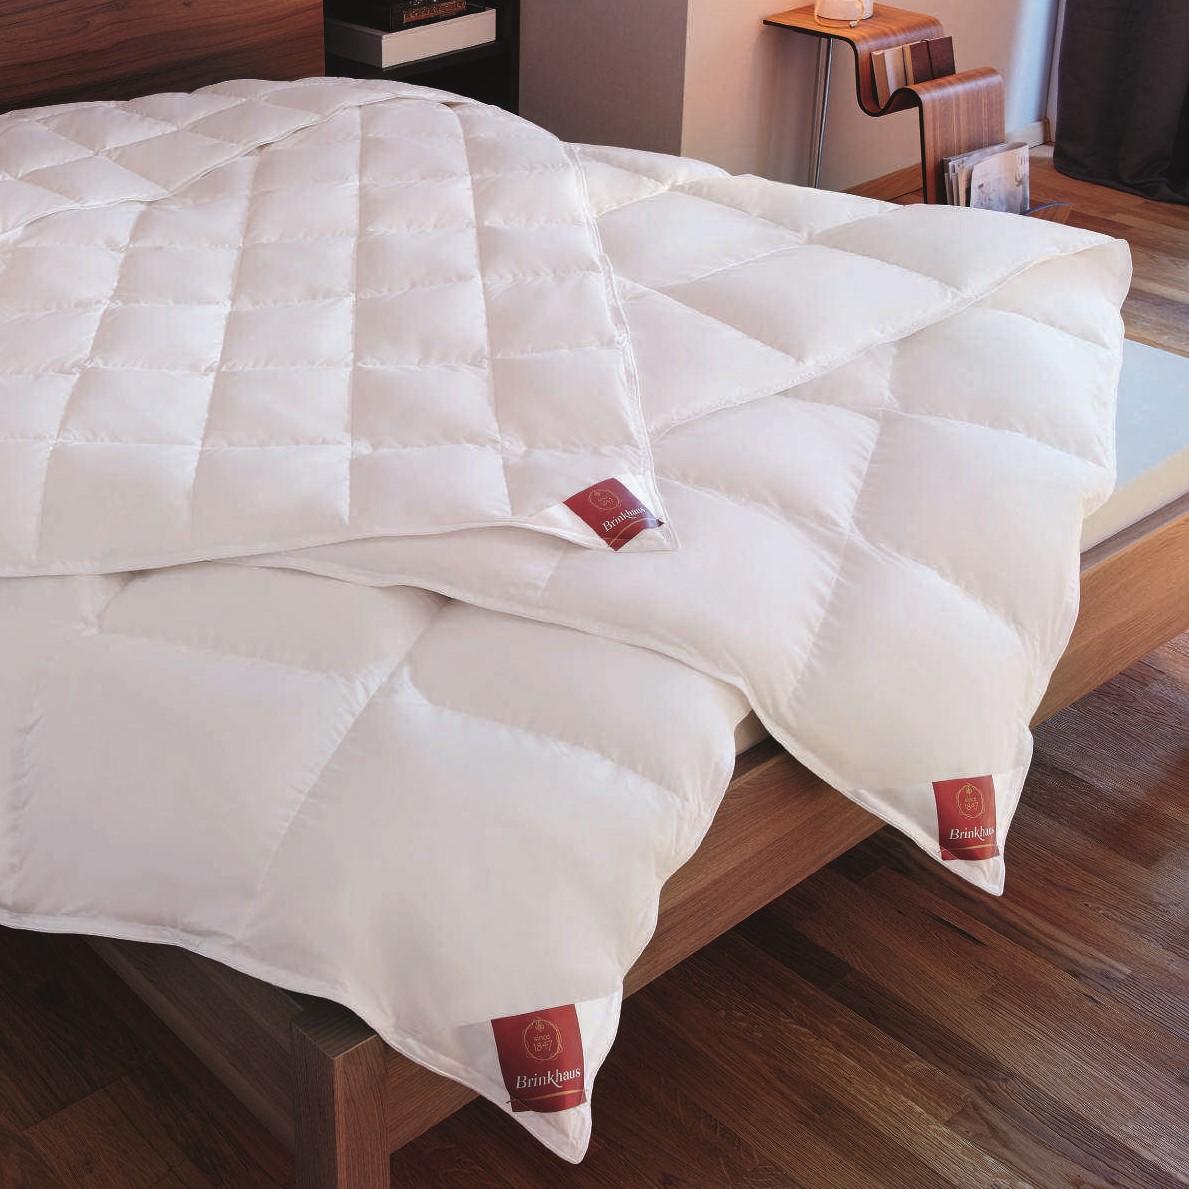 Bedding Essential